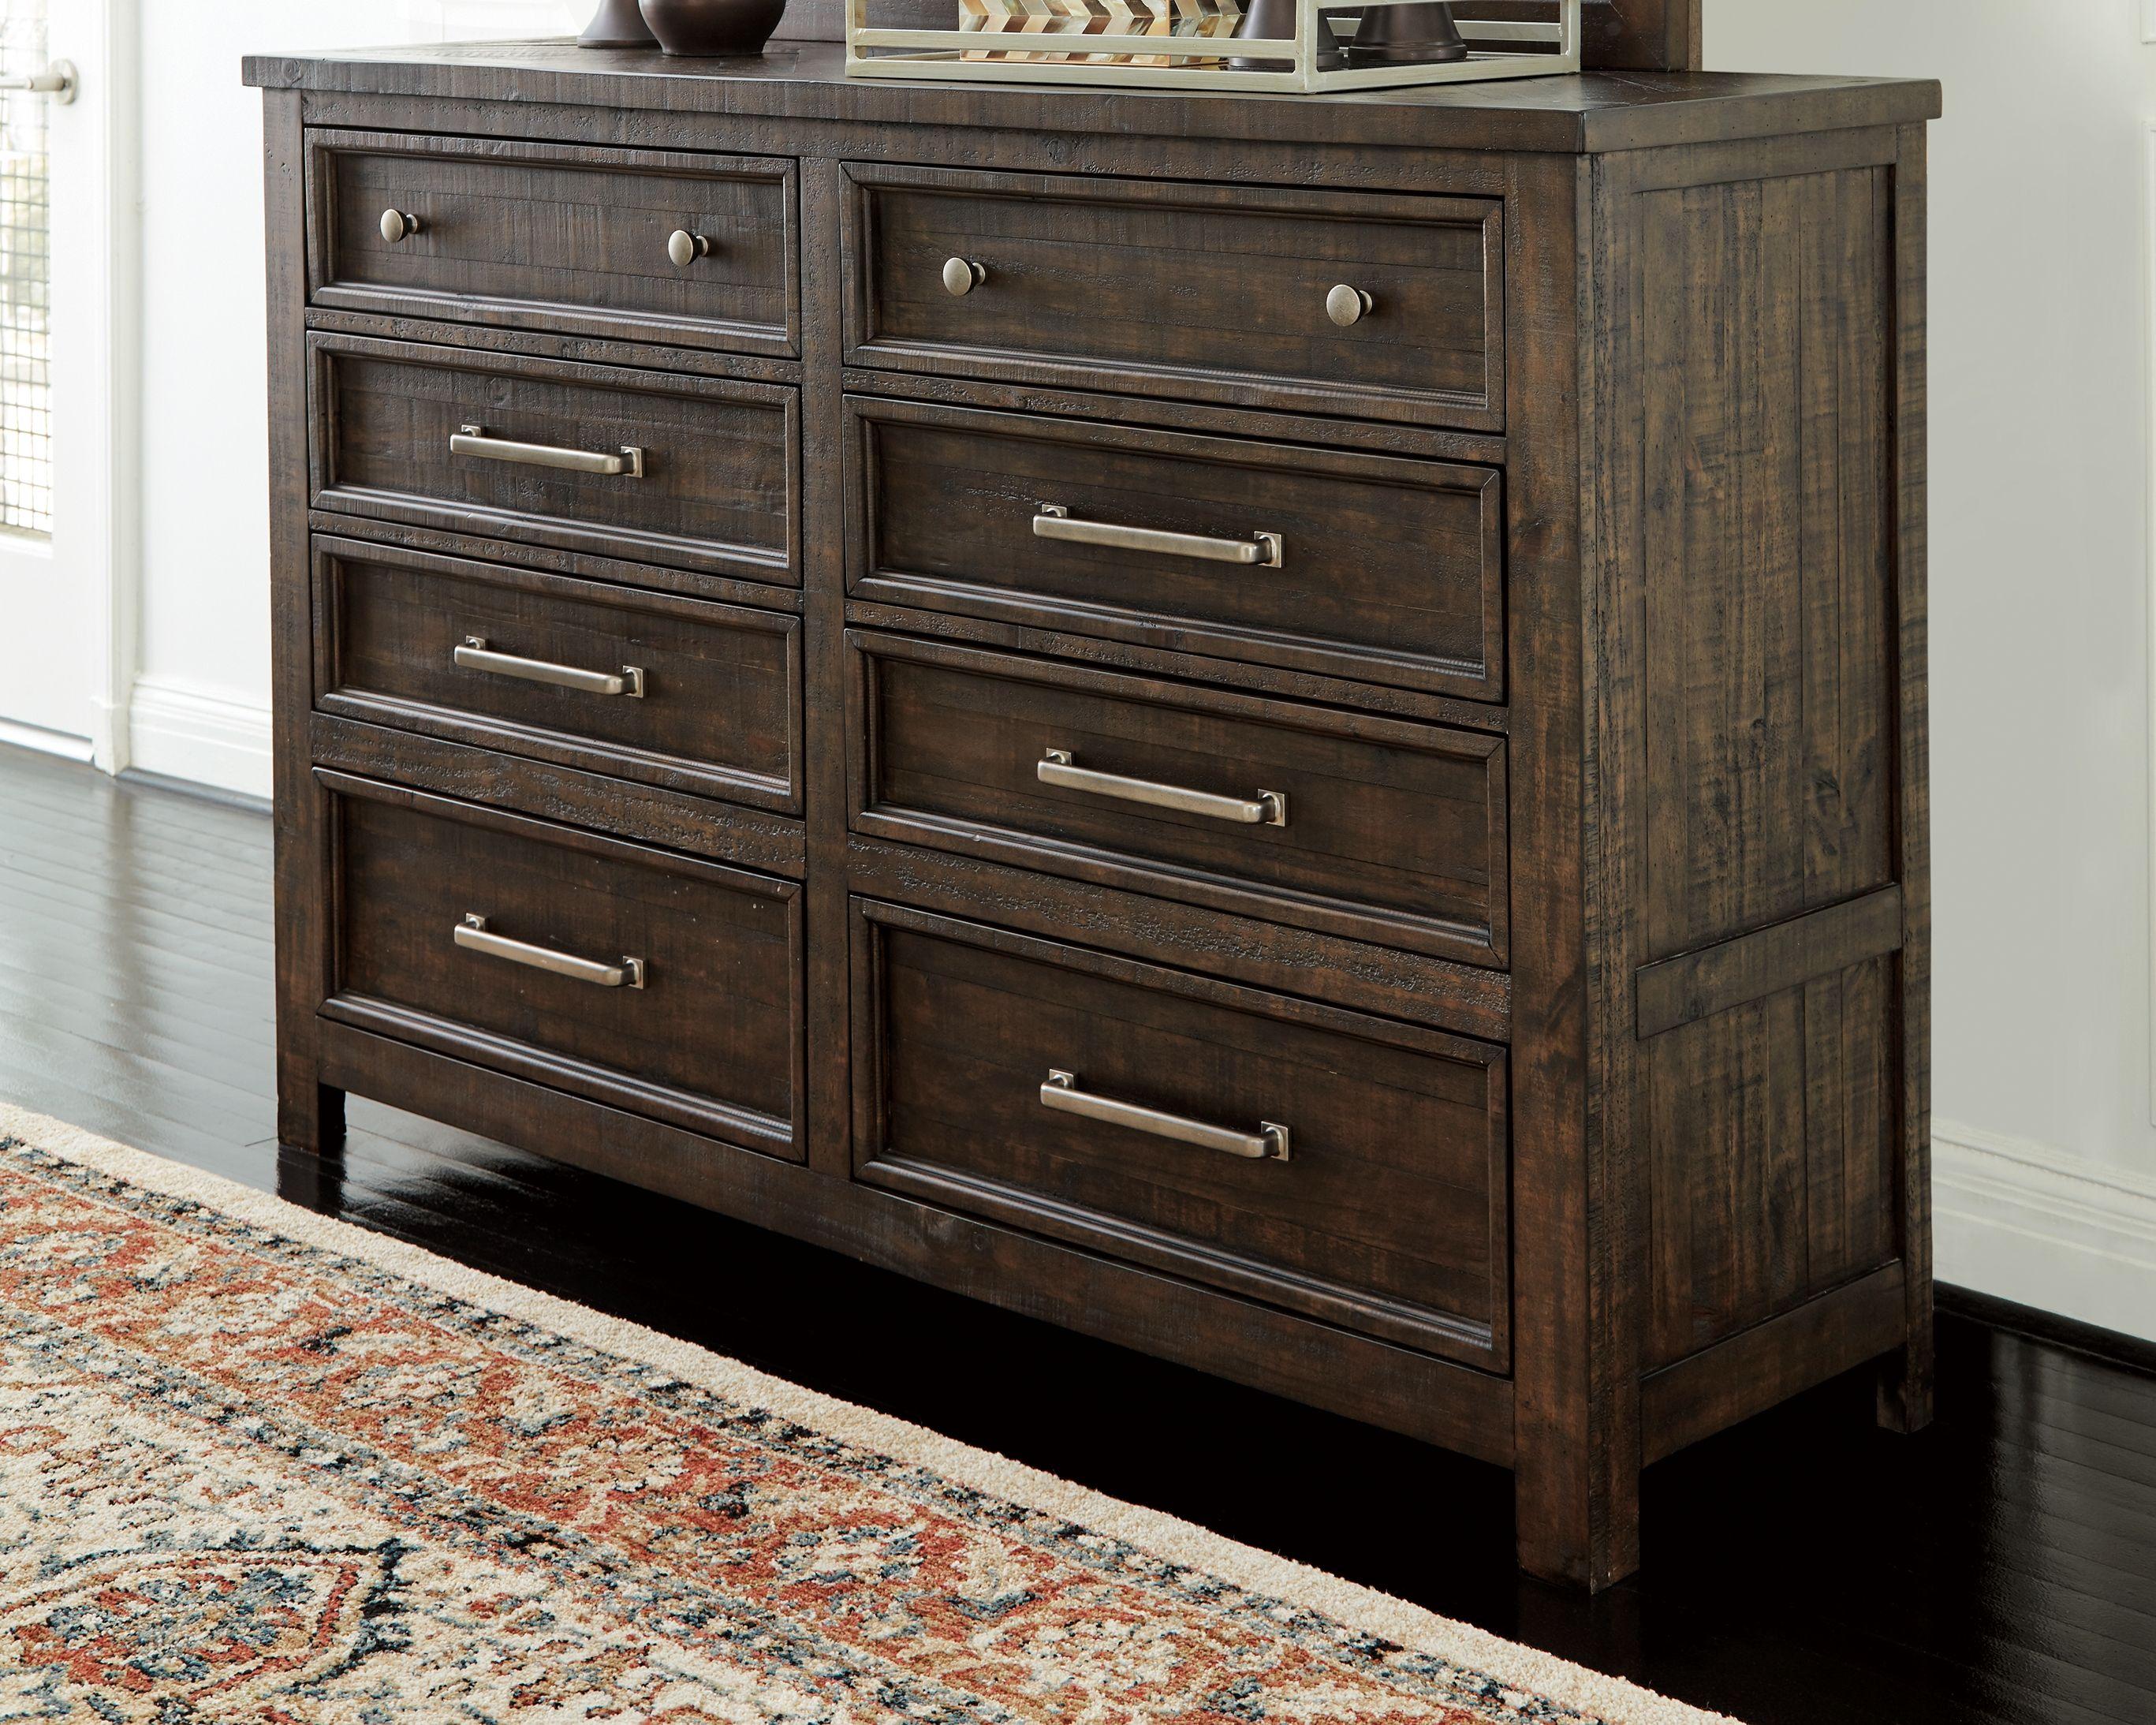 Hillcott Dresser Ashley Furniture Homestore Modern Farmhouse Dresser Ashley Furniture Dresser Dark brown chest of drawers